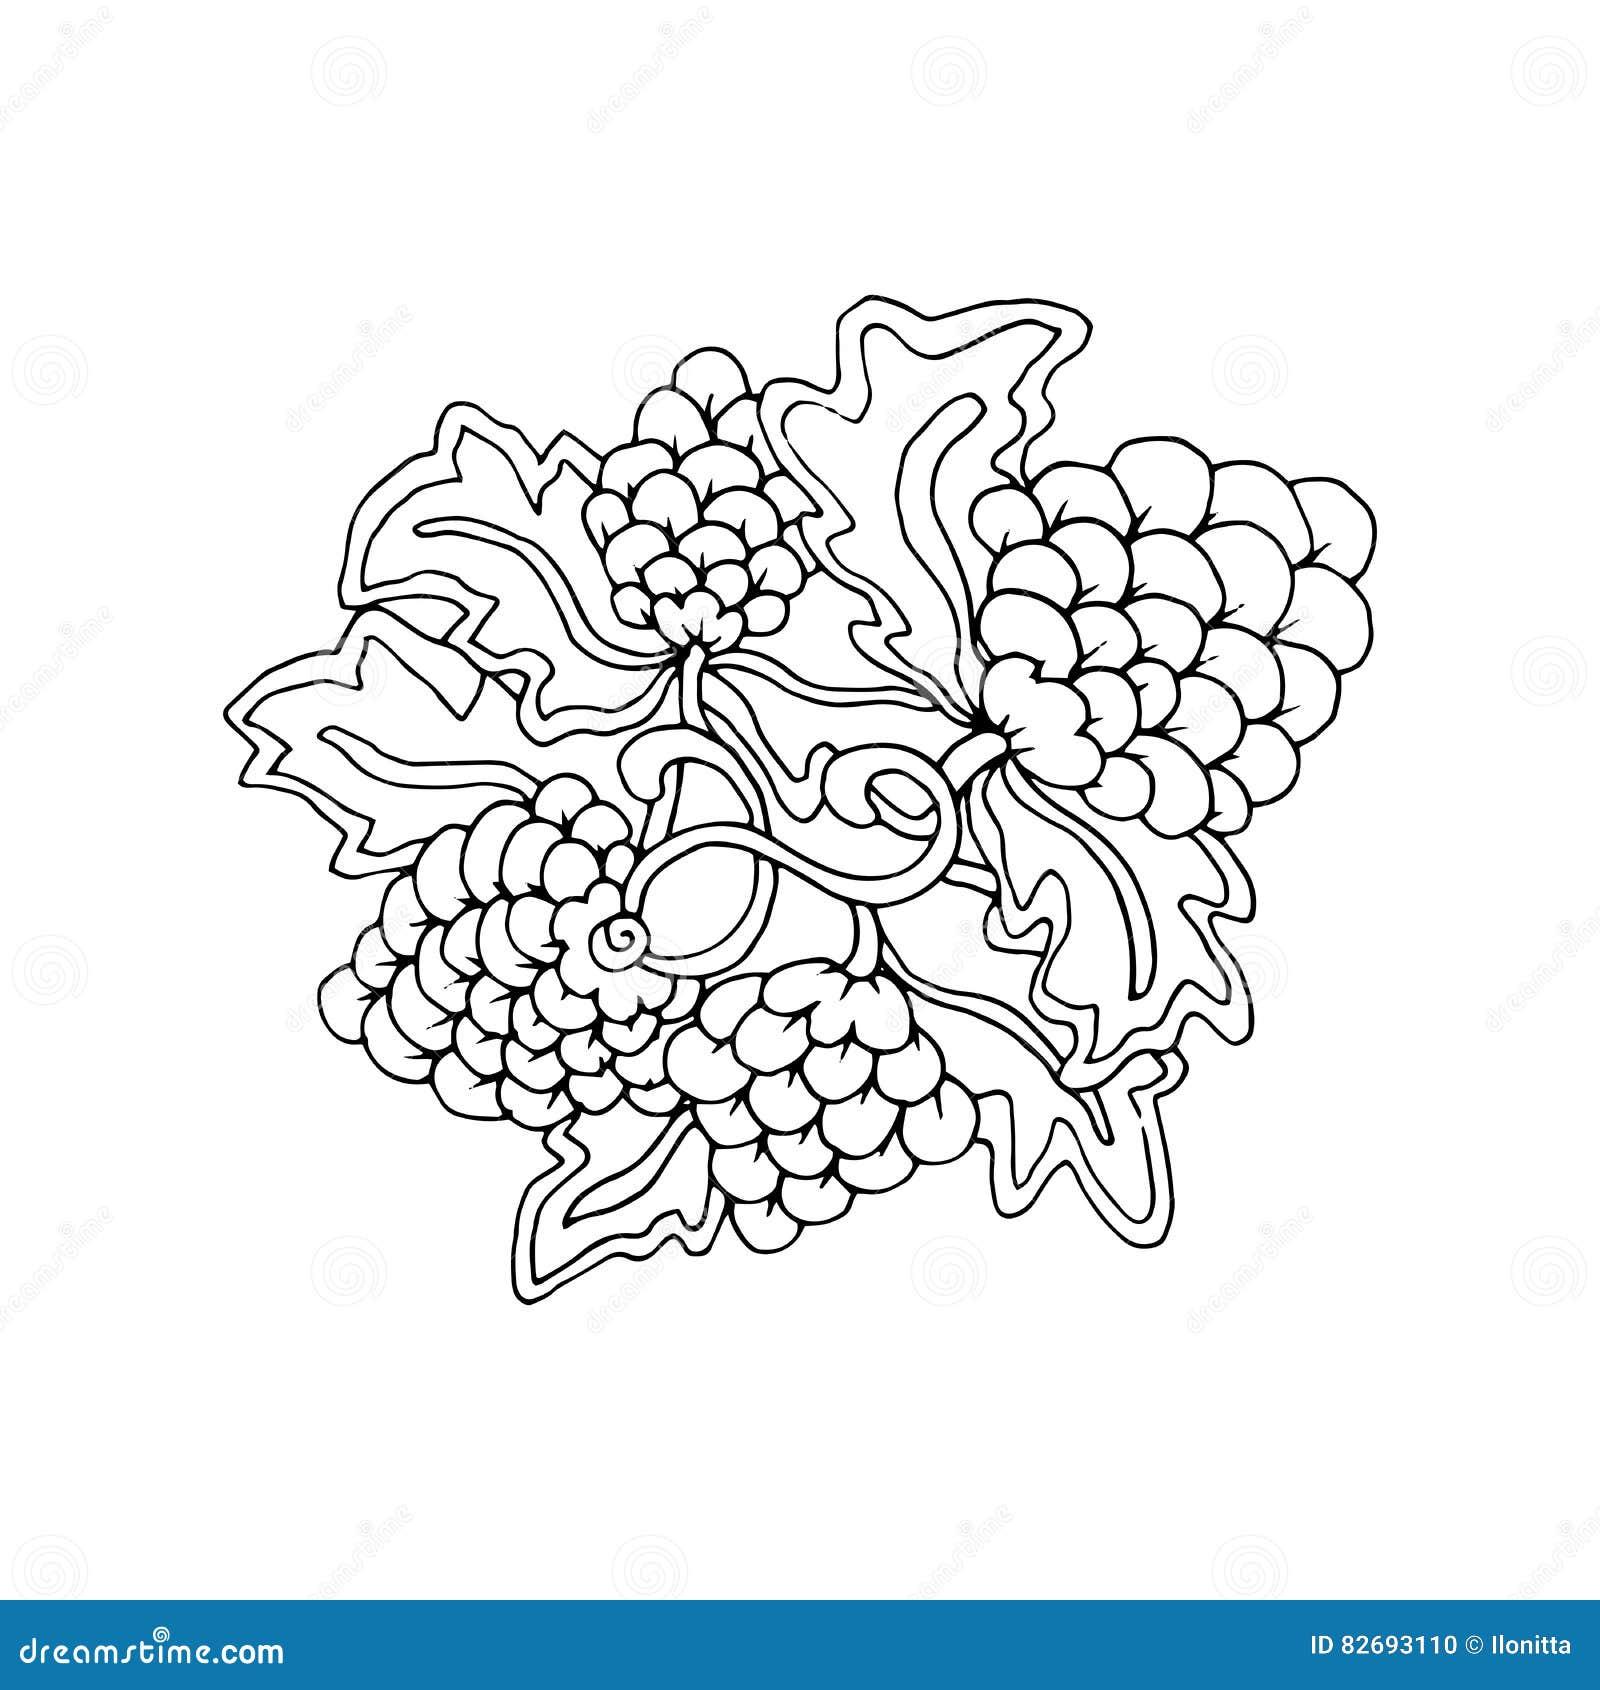 Coloring Grape Stock Illustrations – 226 Coloring Grape Stock ...